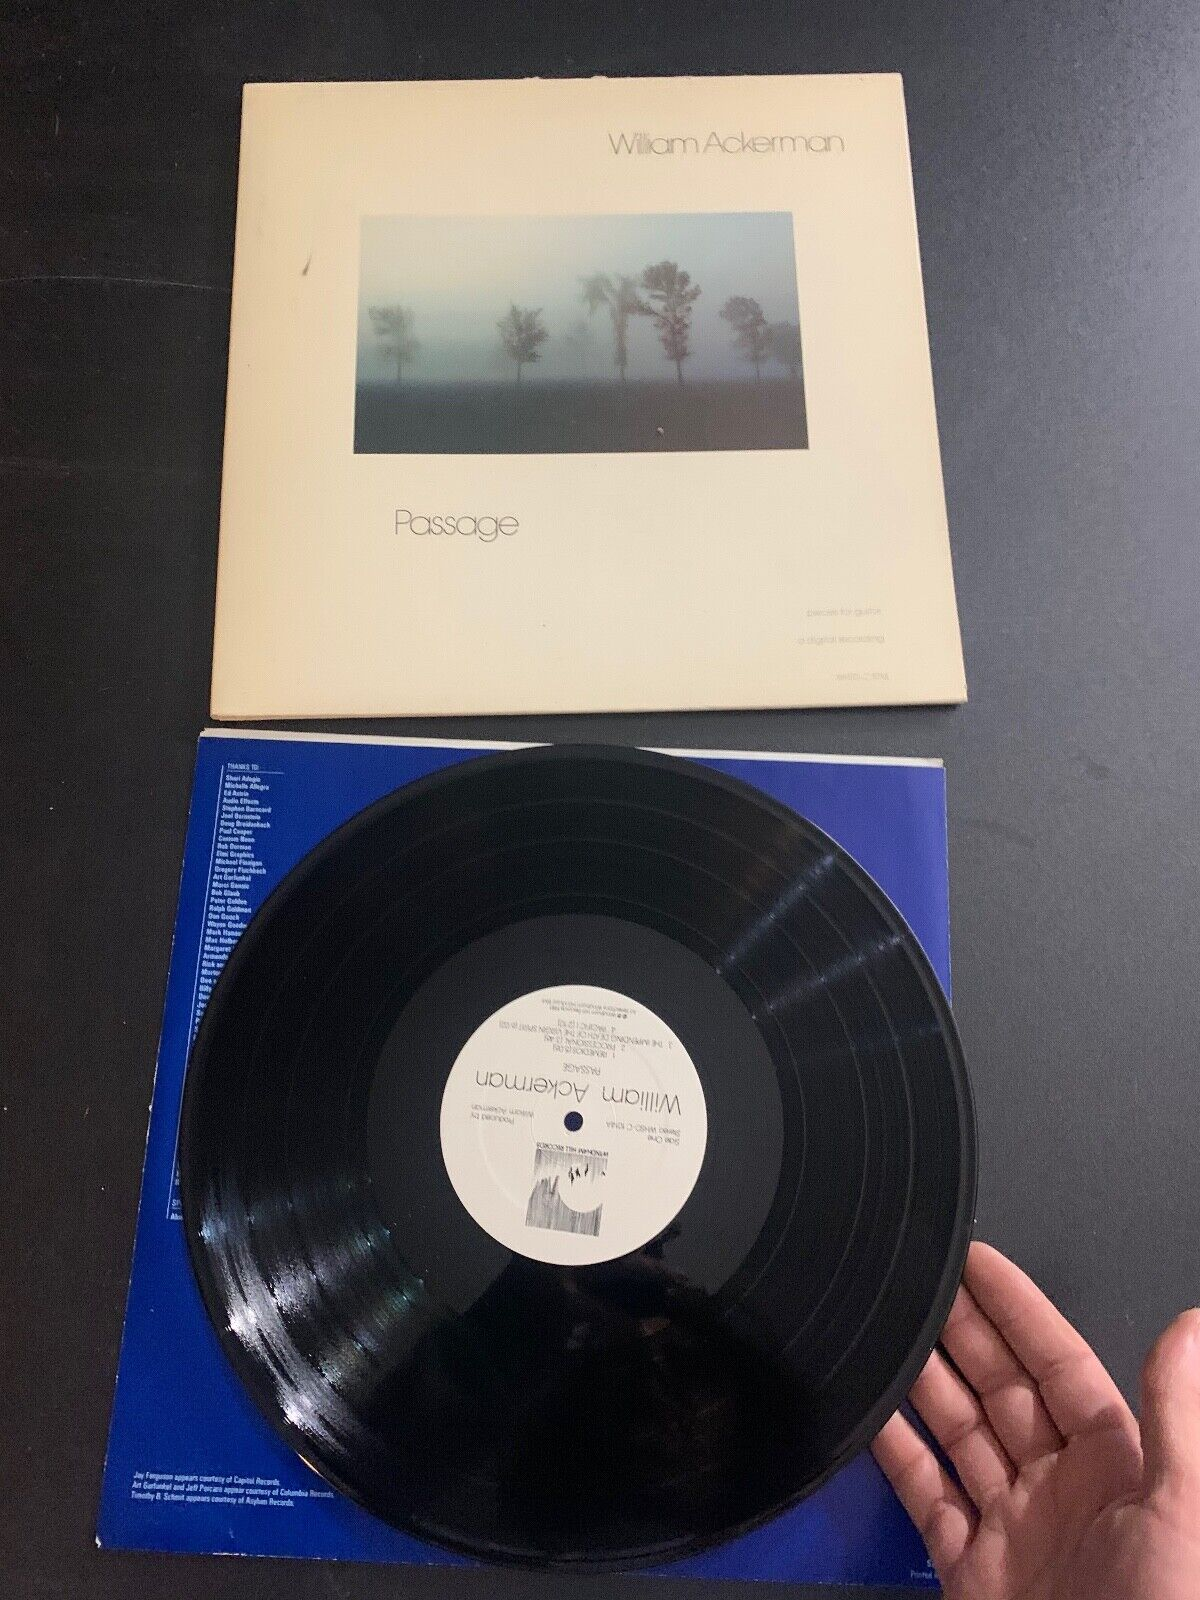 LP RECORD - WILLIAM ACKERMAN - PASSAGE - WINDHAM HILL RECORDS - $9.99